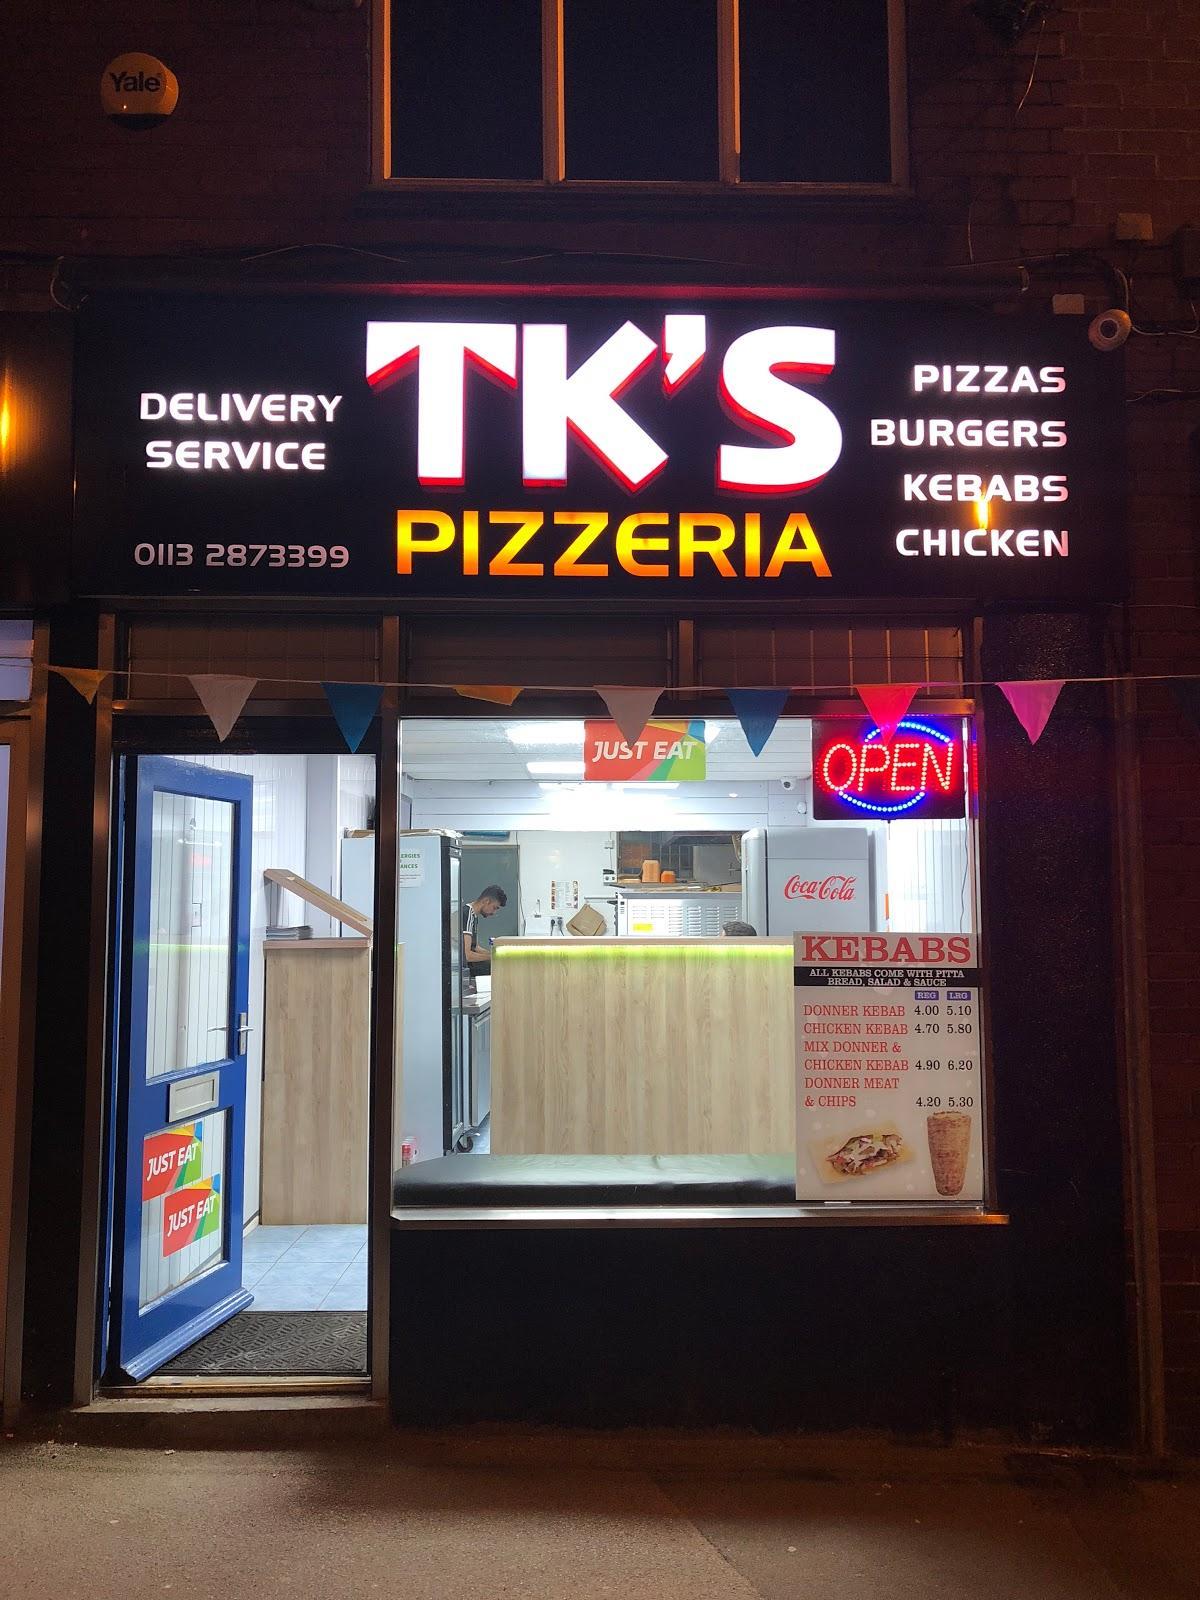 Tks Pizzeria In Leeds Restaurant Menu And Reviews